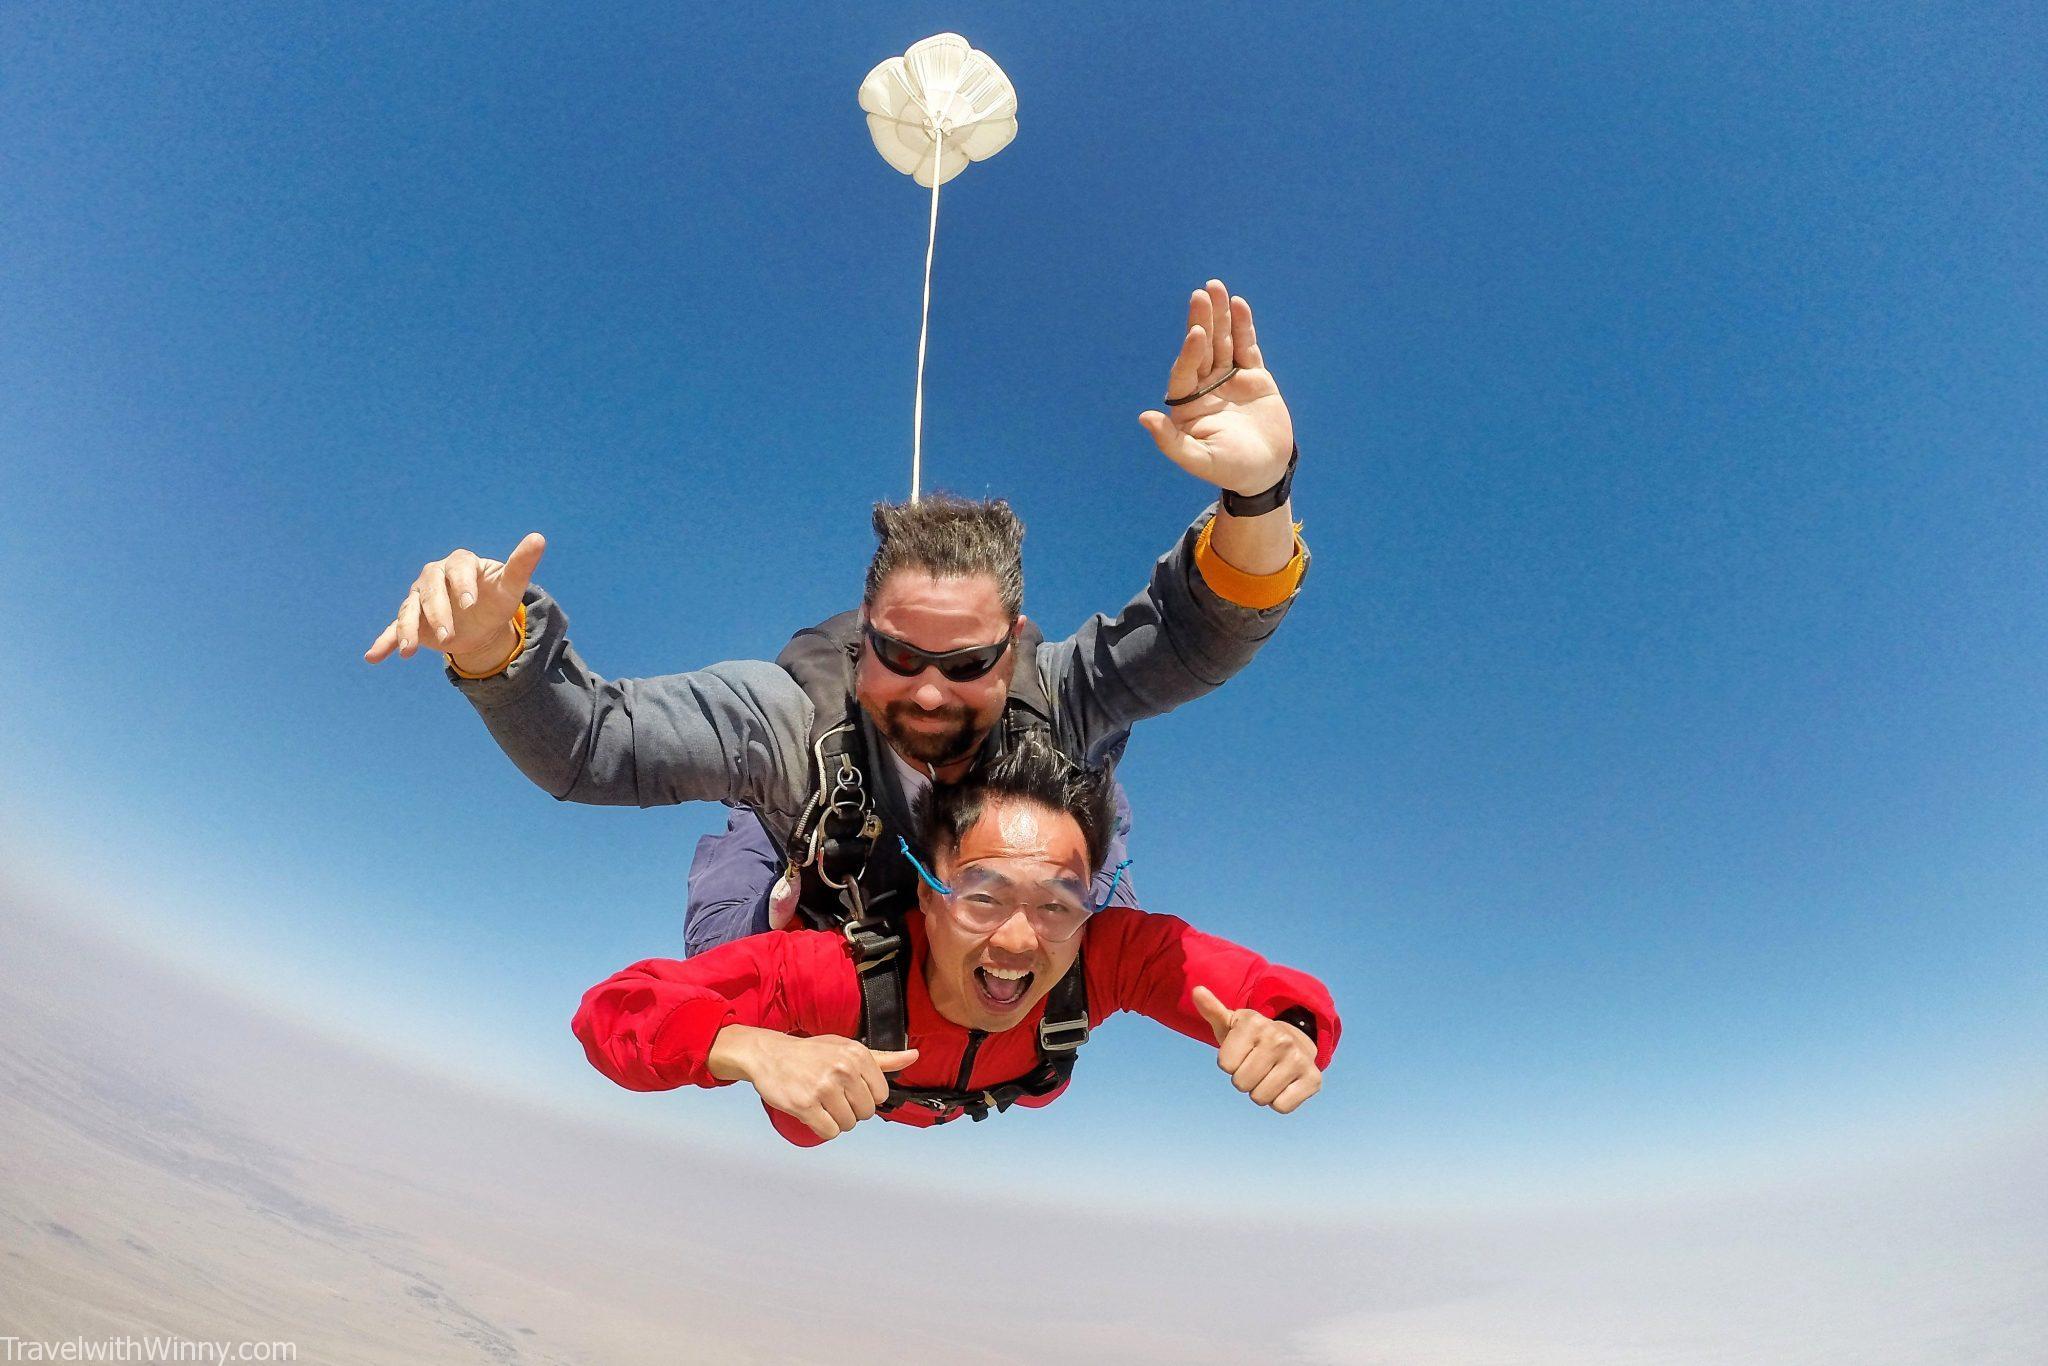 Namibia: Skydiving in Swakopmund – Travel with Winny